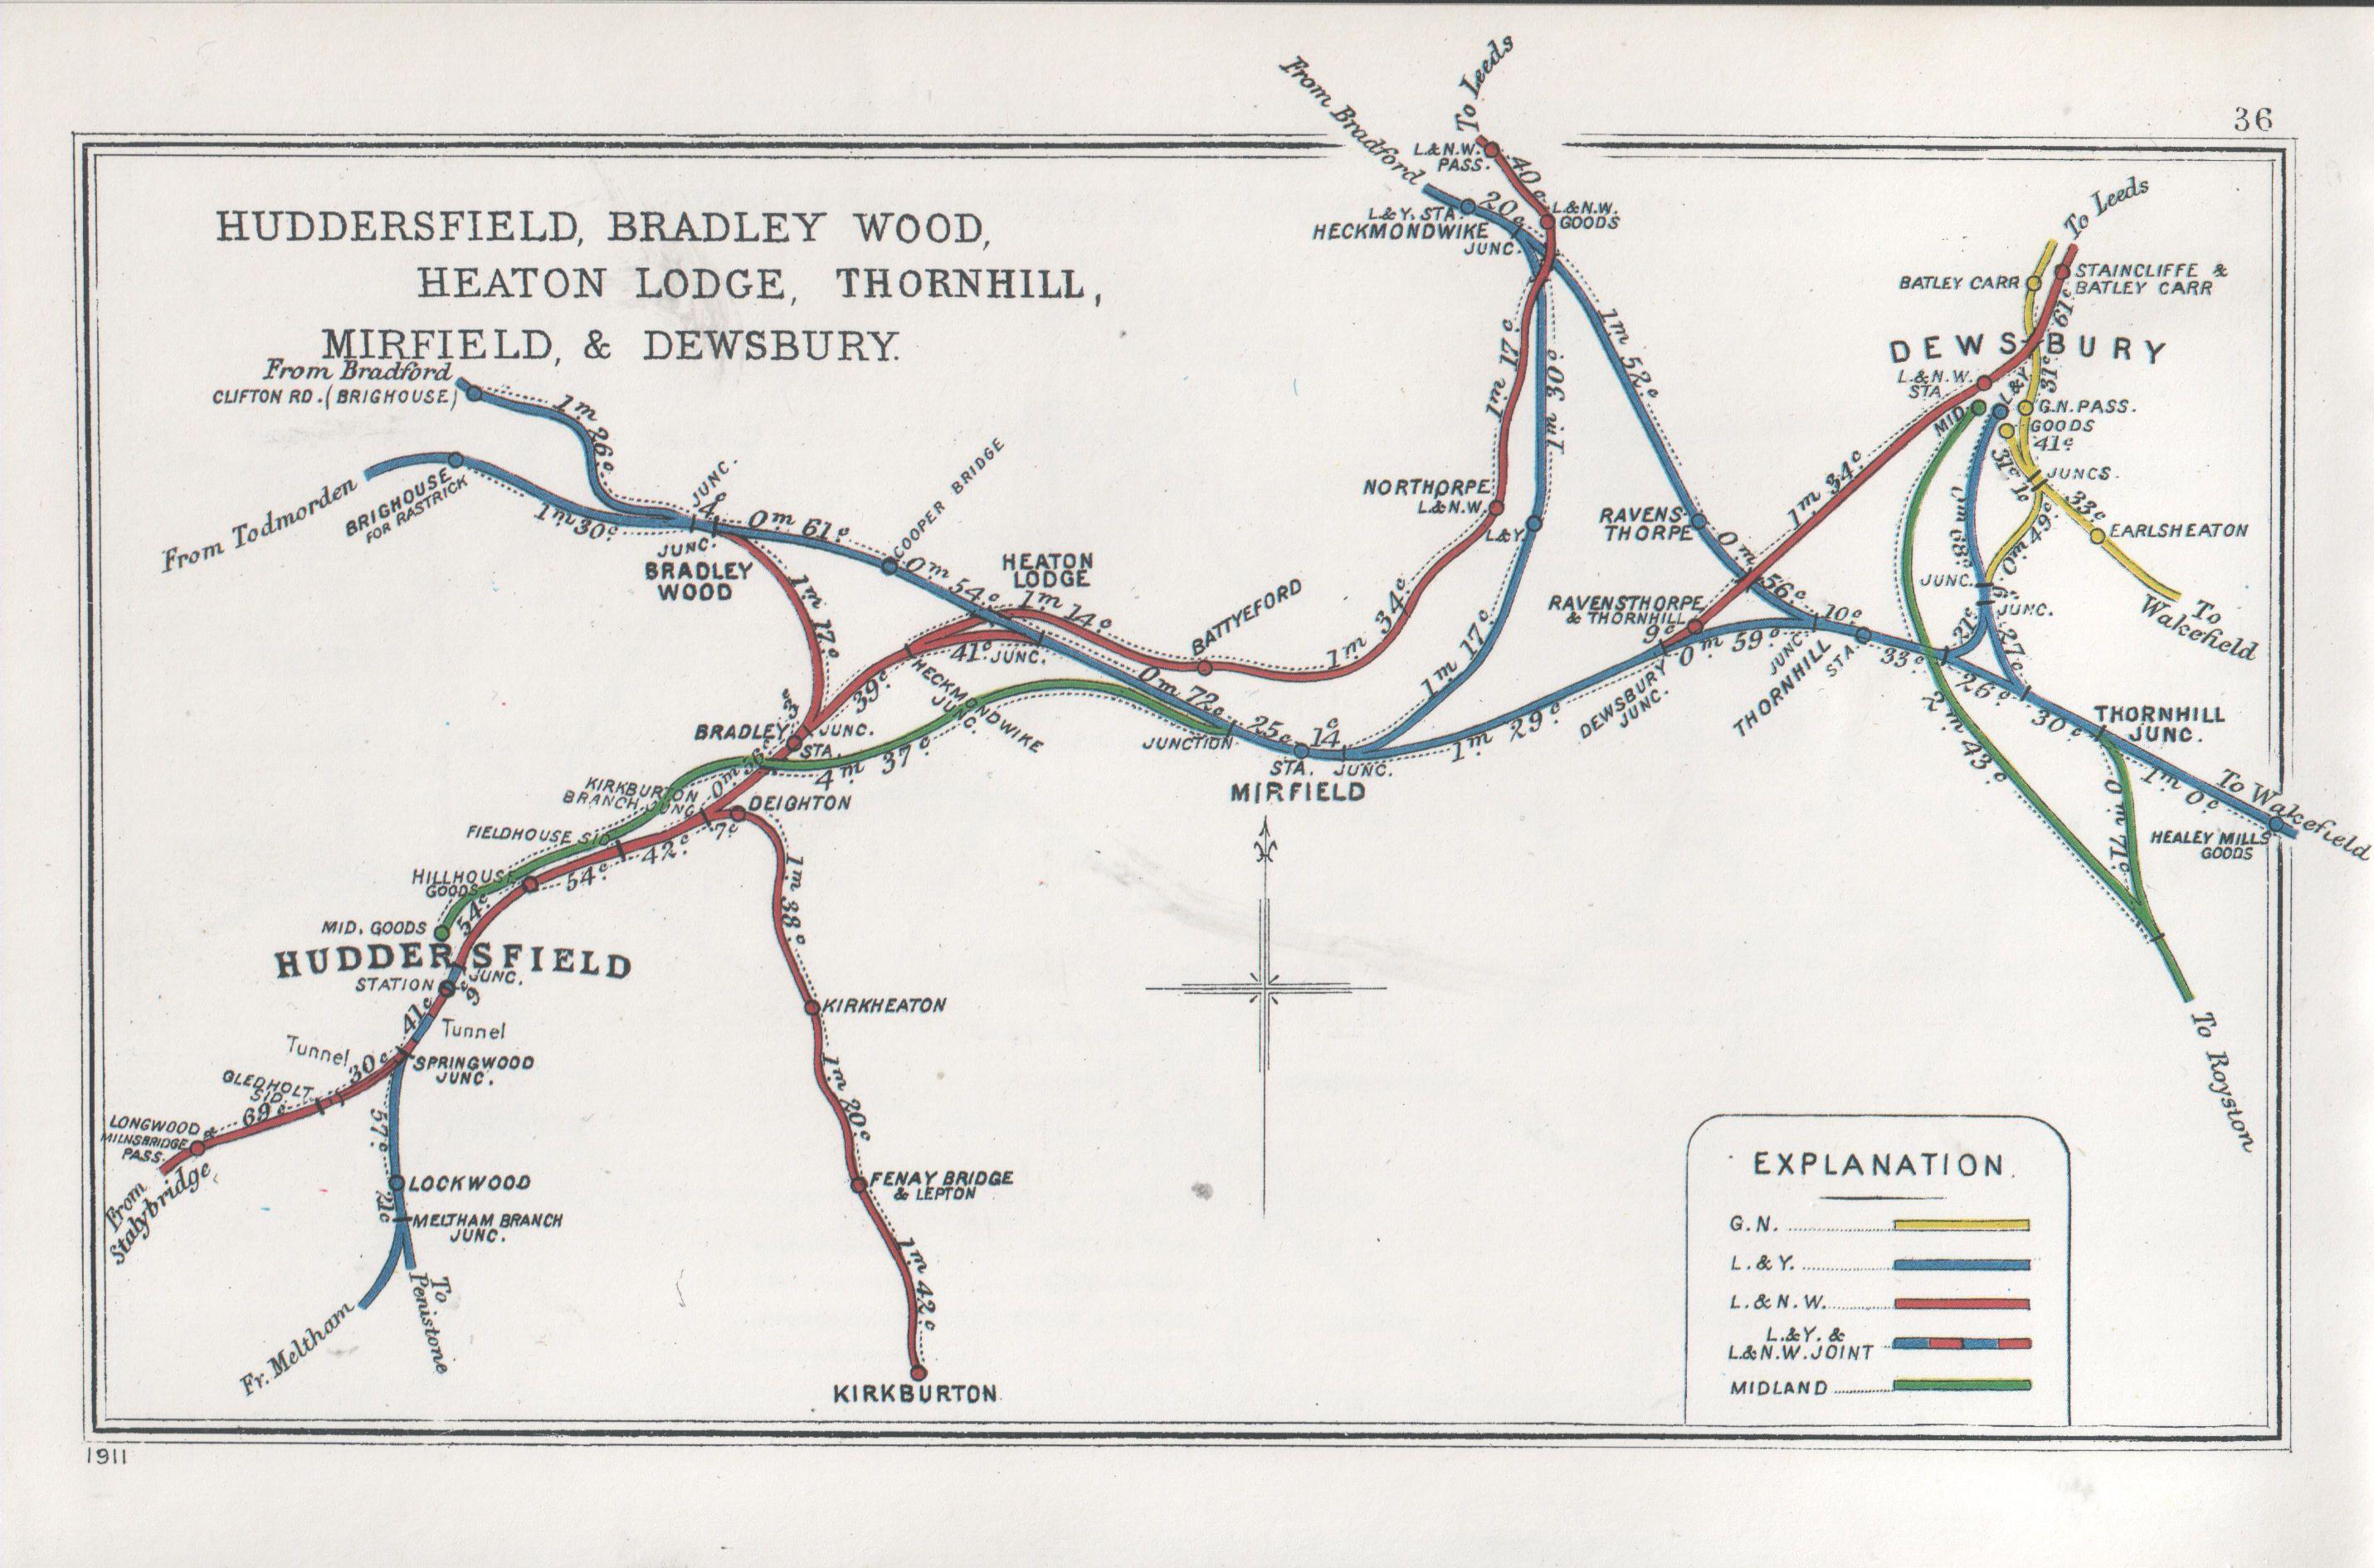 Huddersfield Bradley Wood Heaton Lodge Thornhill Mirfield